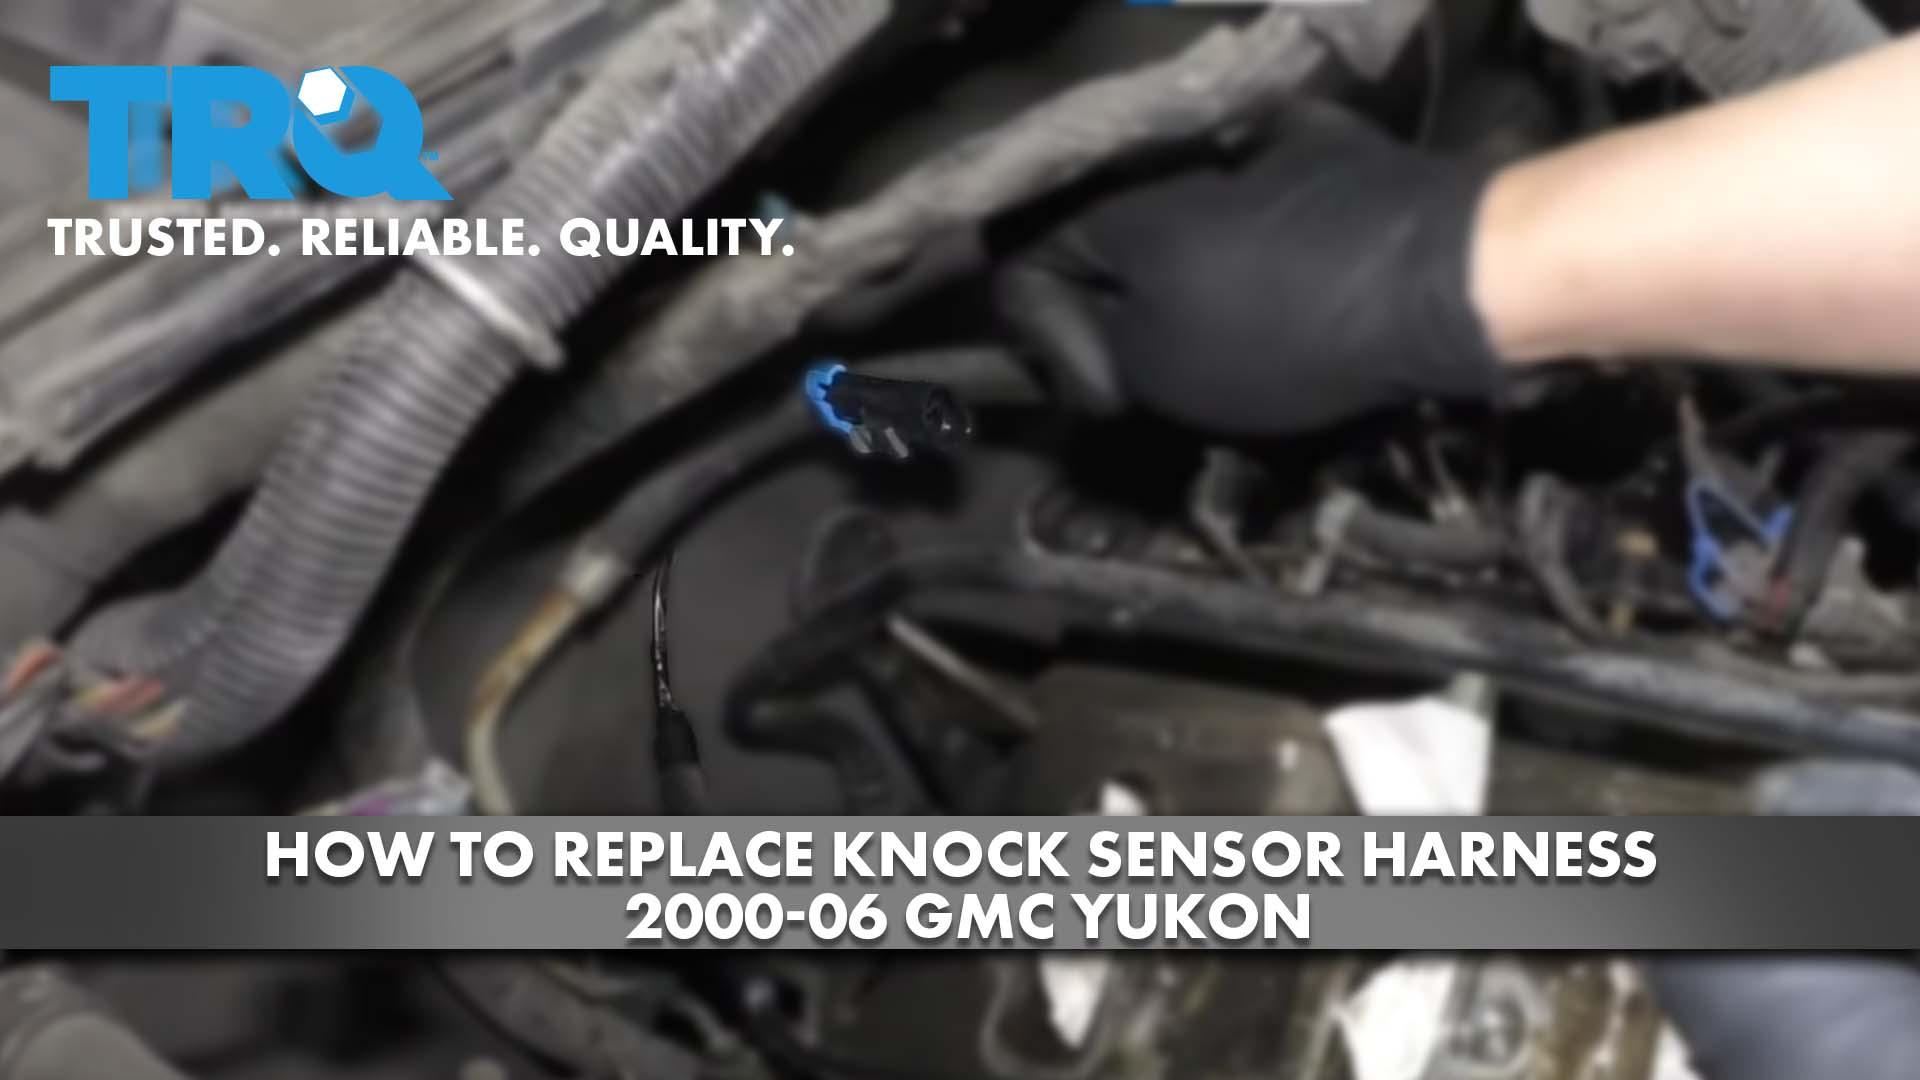 How to Replace Knock Sensor Harness 2000-06 GMC Yukon